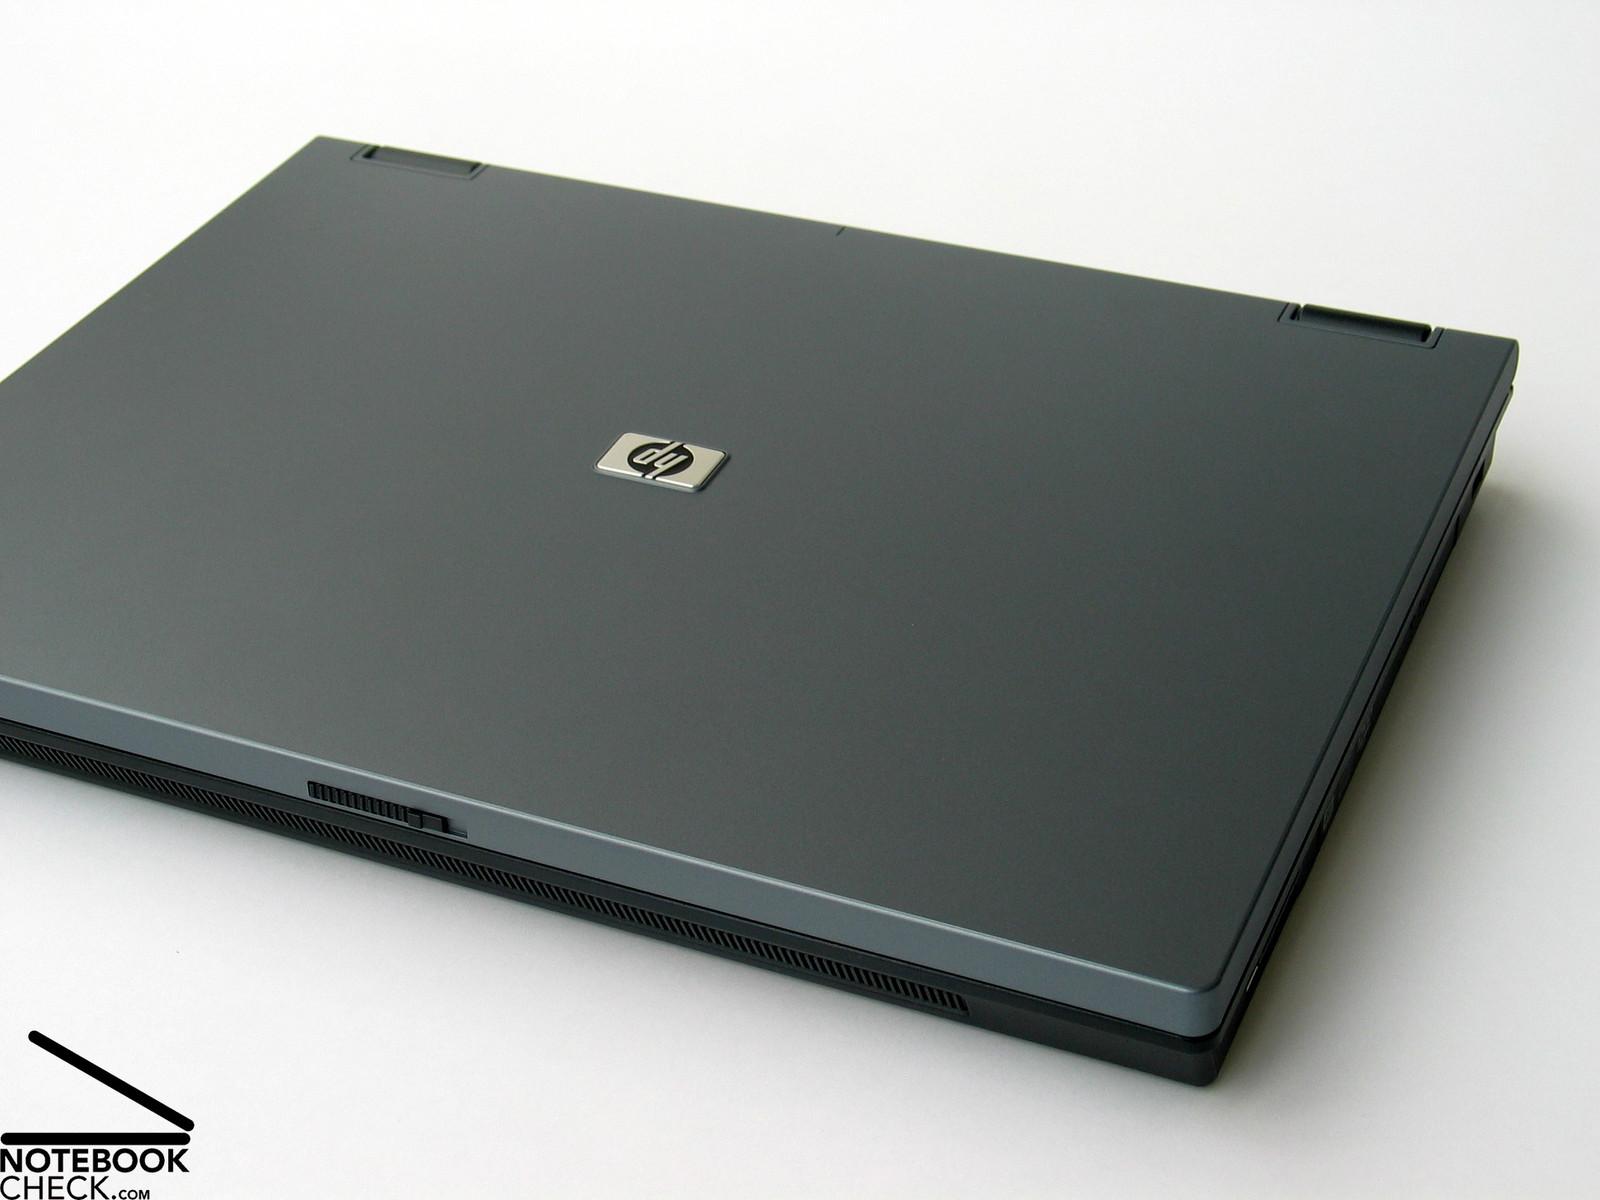 Drivers HP Compaq nx6325 Notebook Seagate HDD